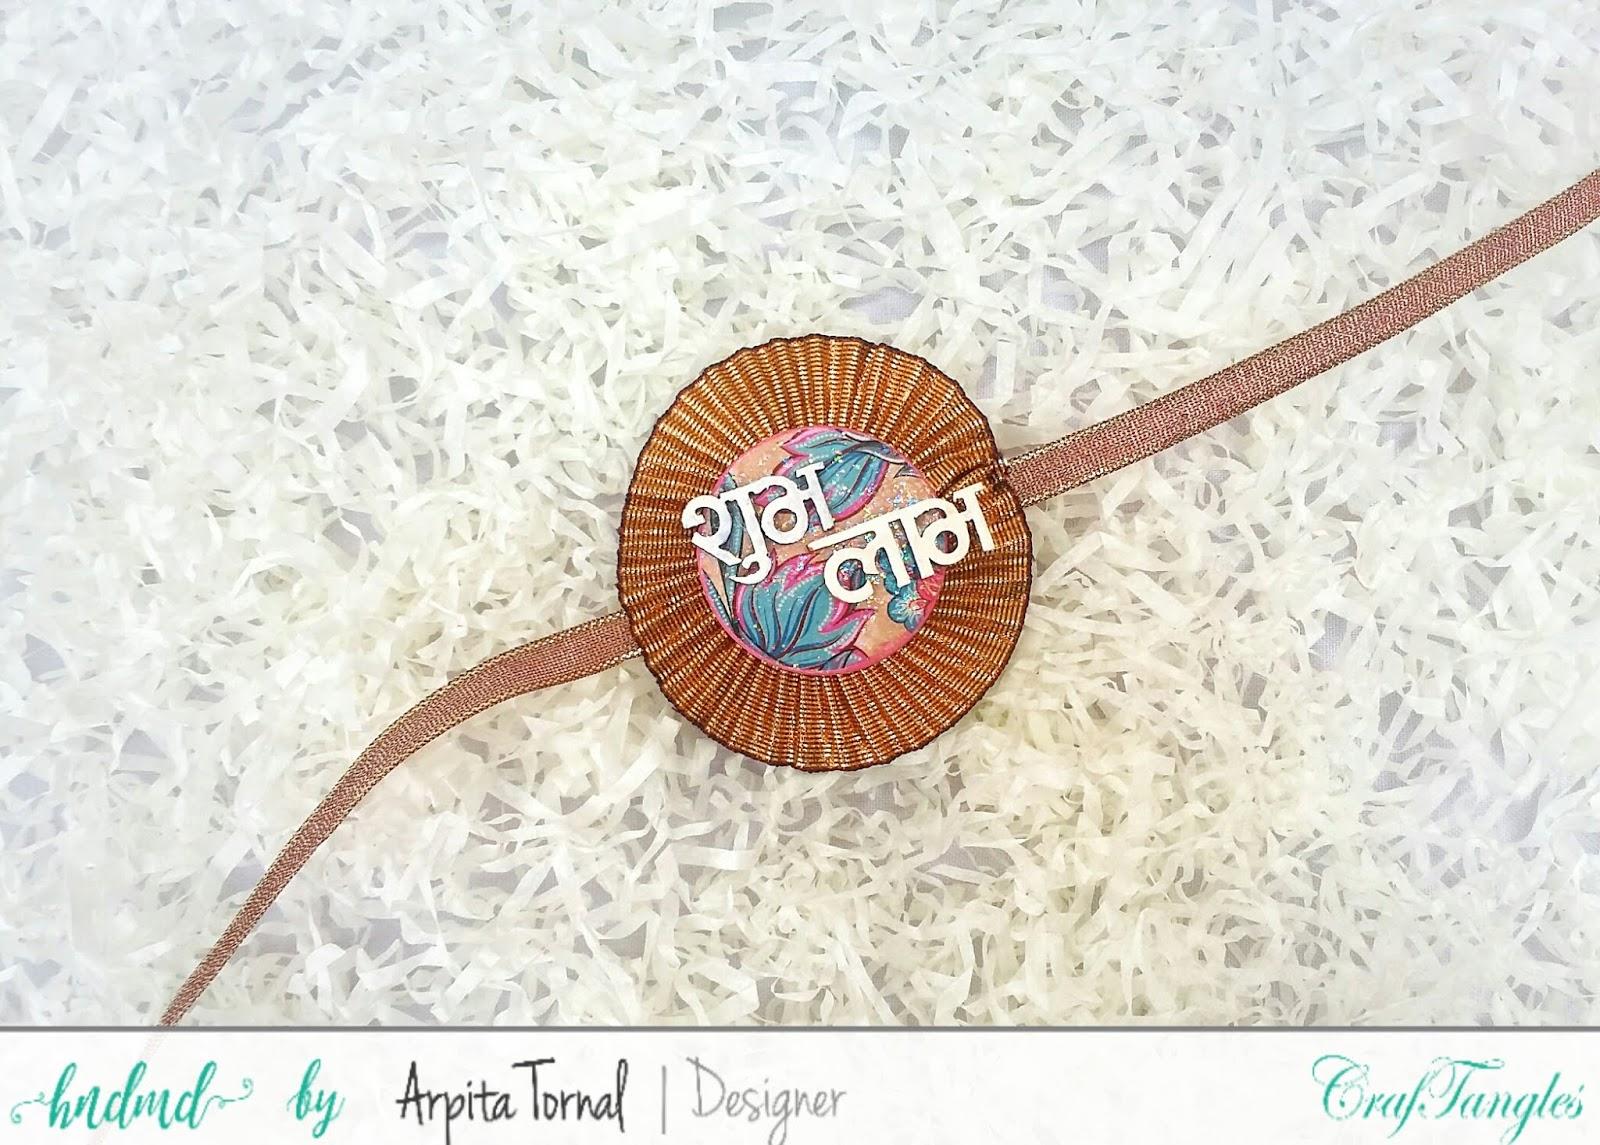 DIY Decoupage Rakhi's using CrafTangles decoupage products by Arpita Tornal 1